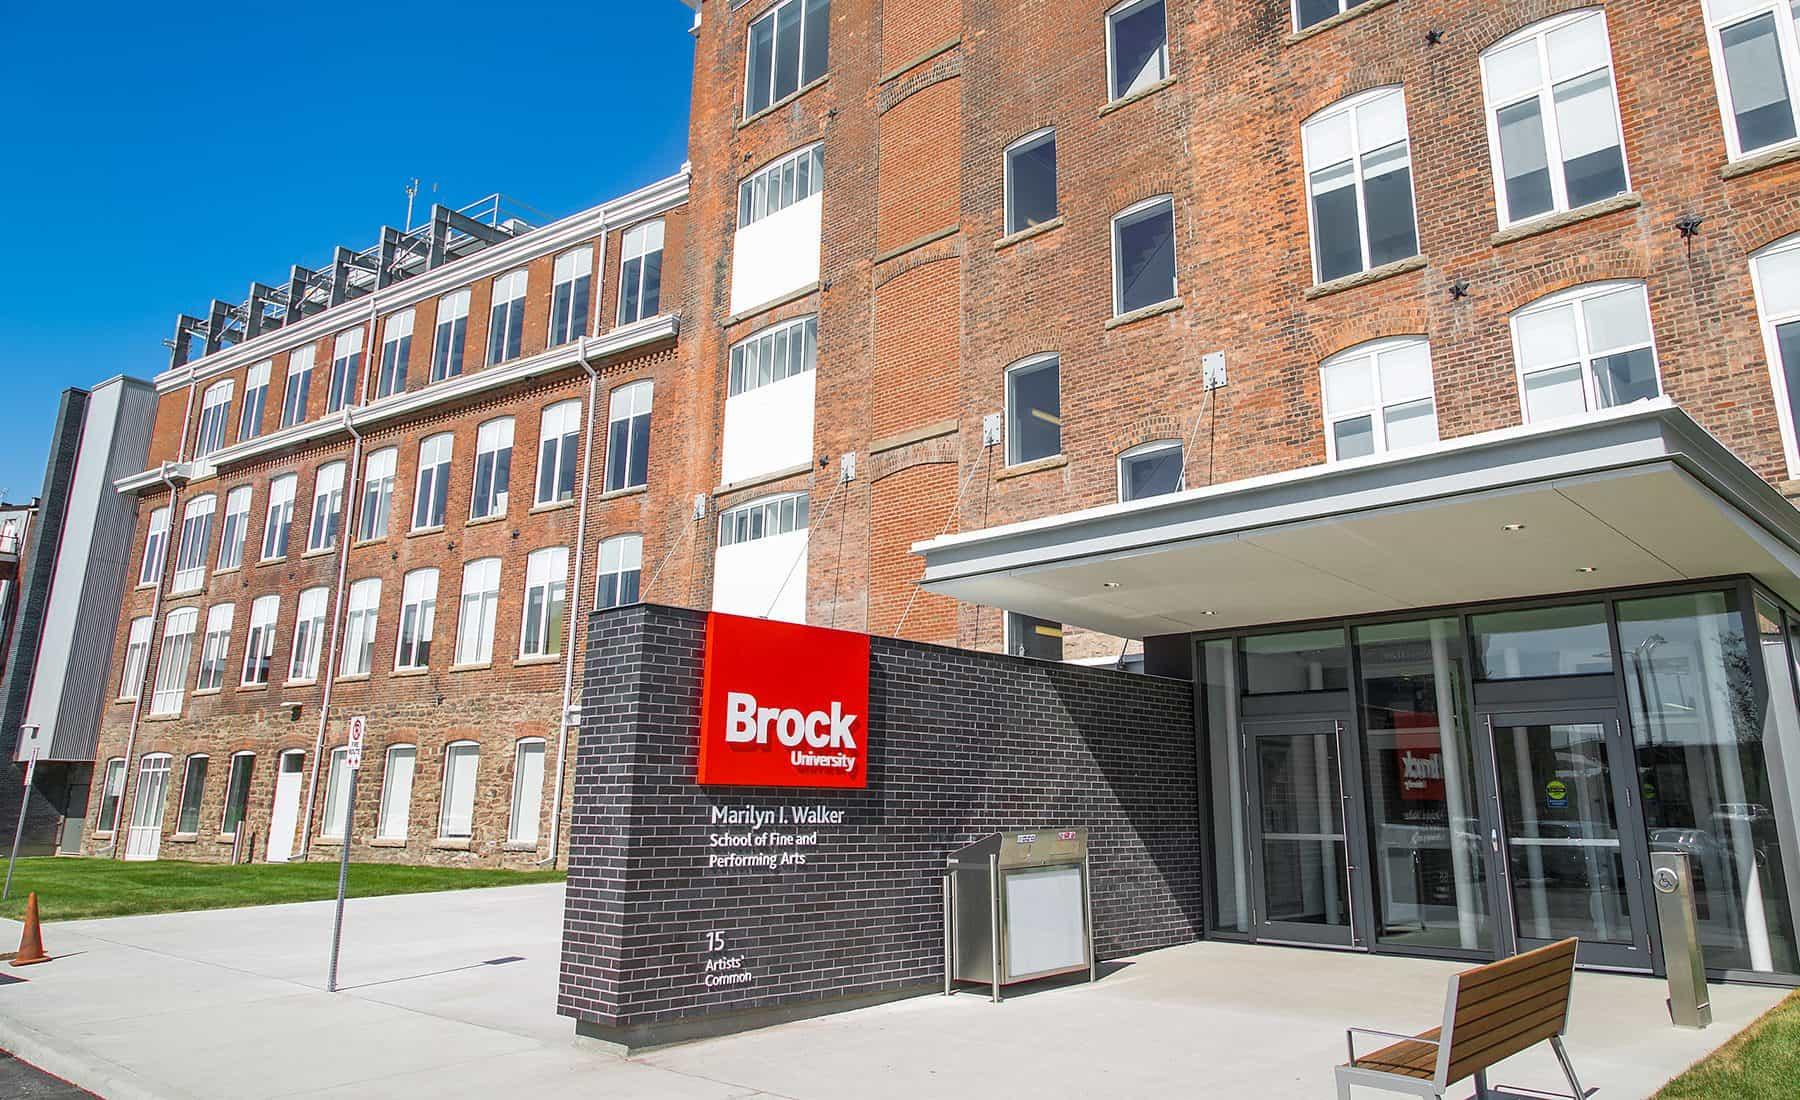 brock-downtown-campus-9-1800x1100